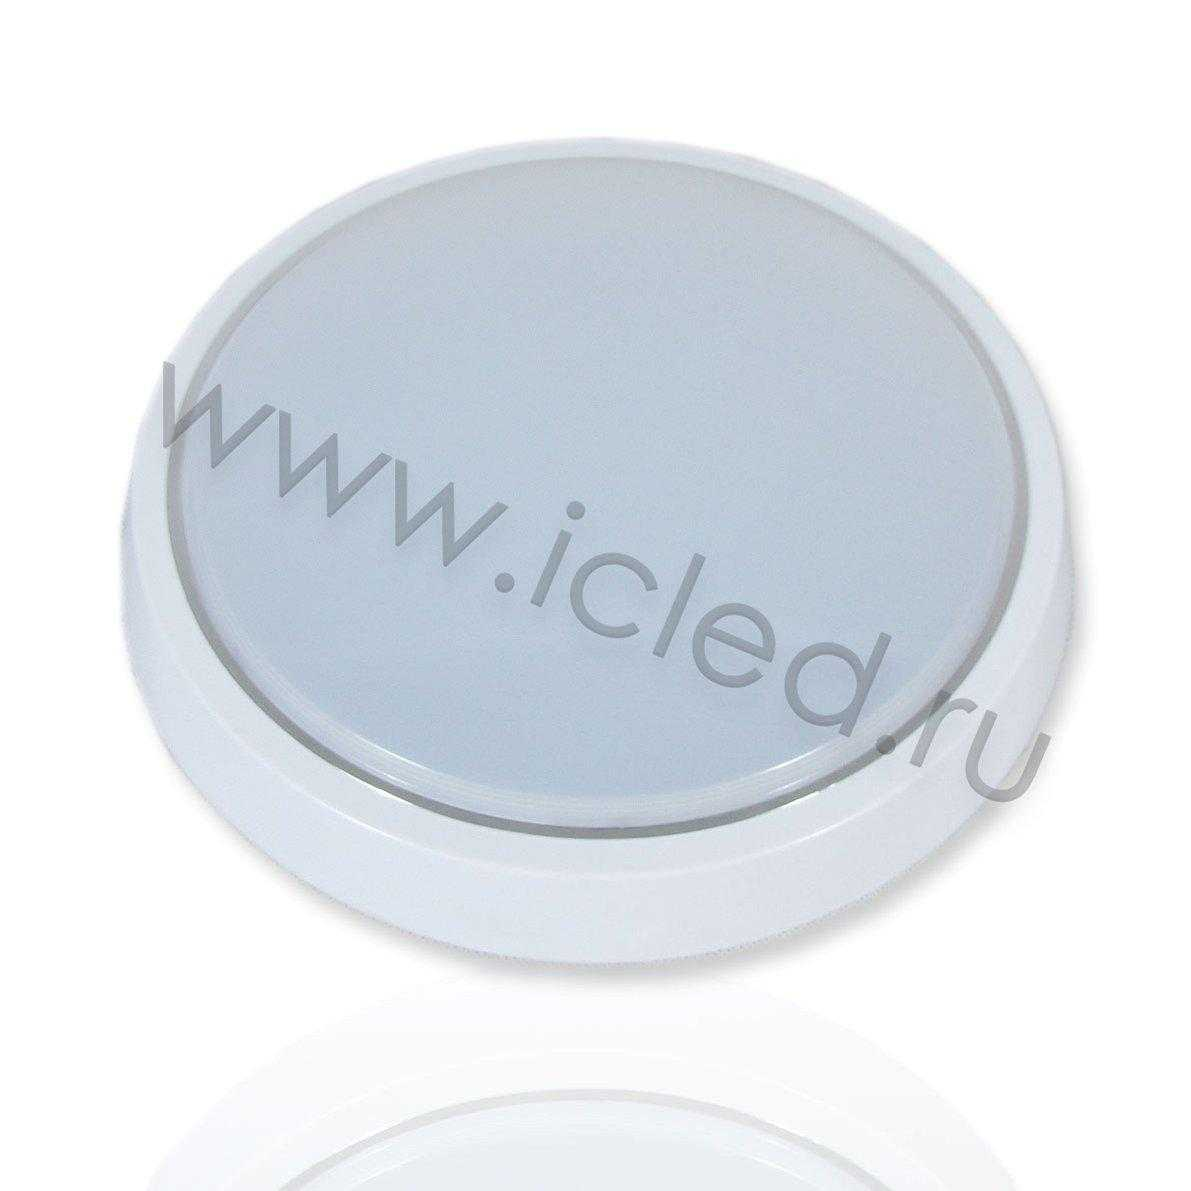 Светодиодный светильник MR-RW D310 (16W, Warm White)